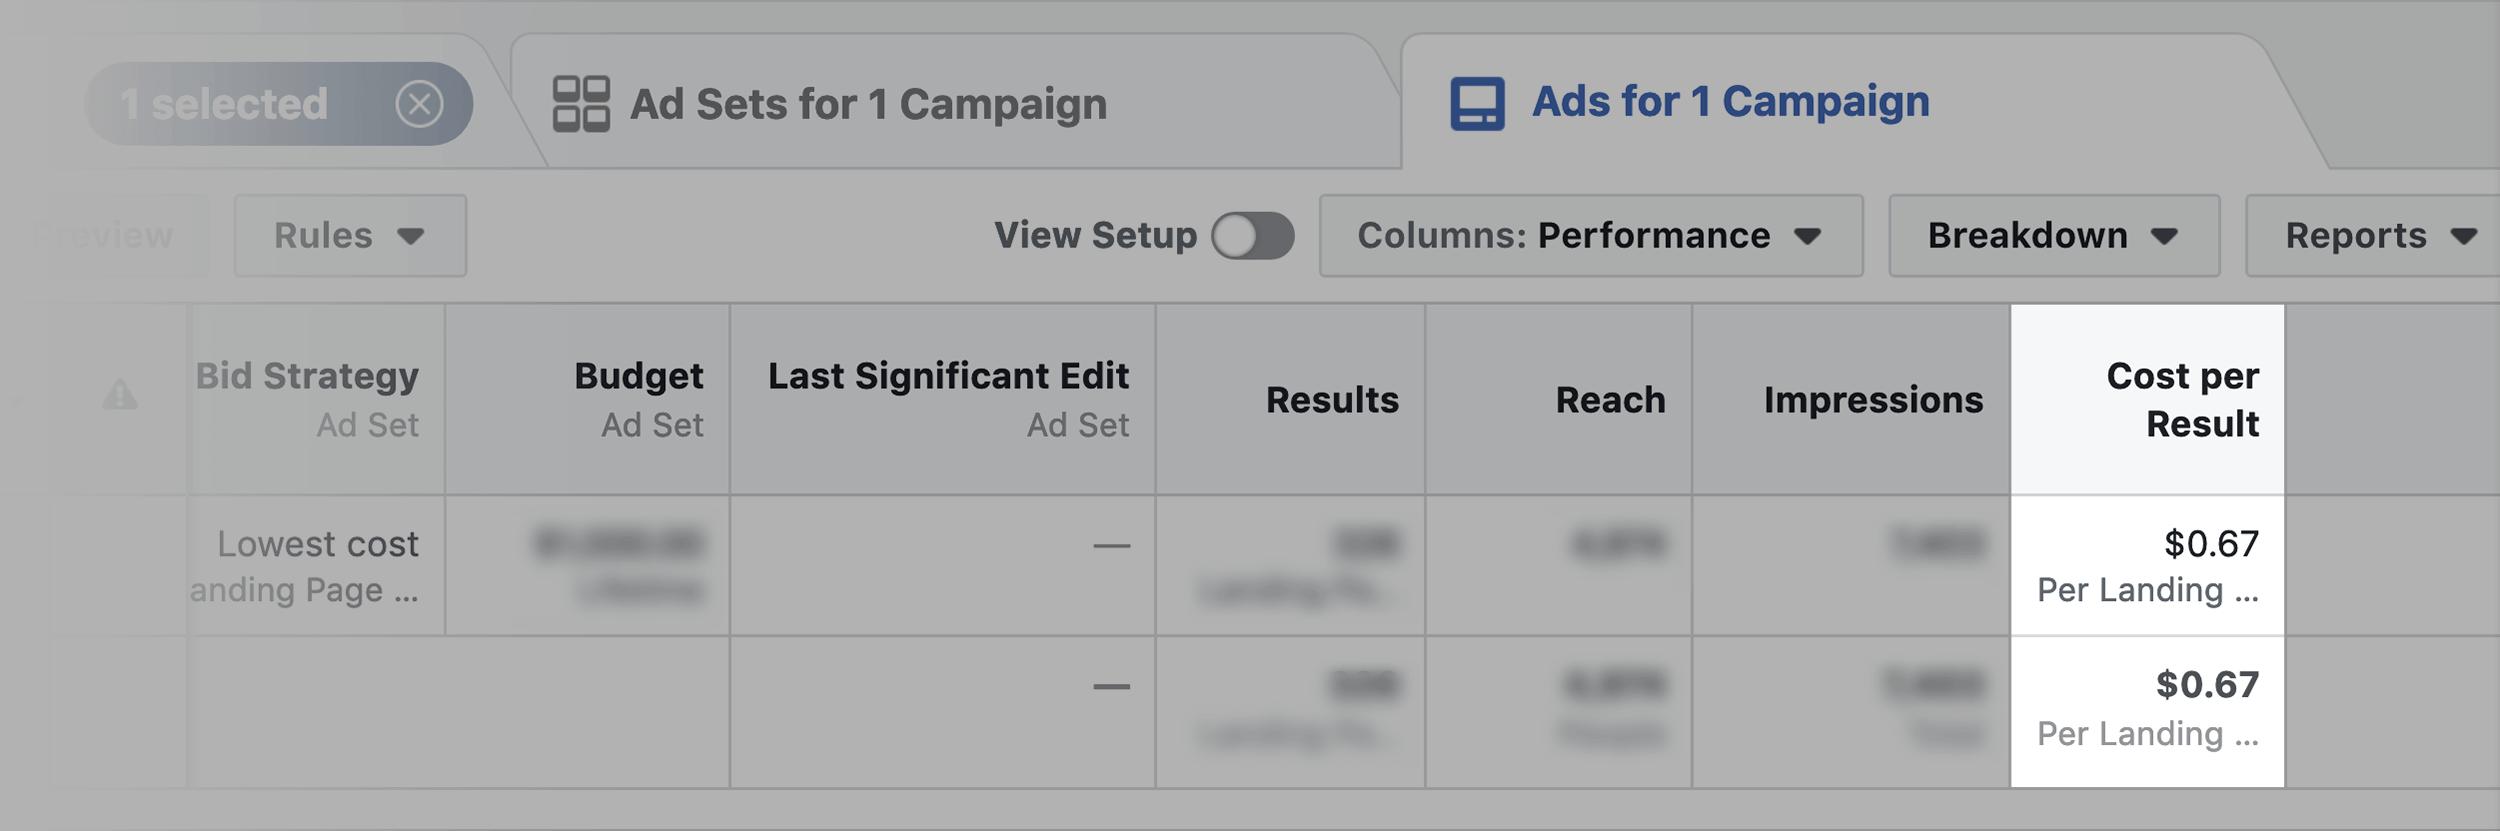 facebook retarget ad cost